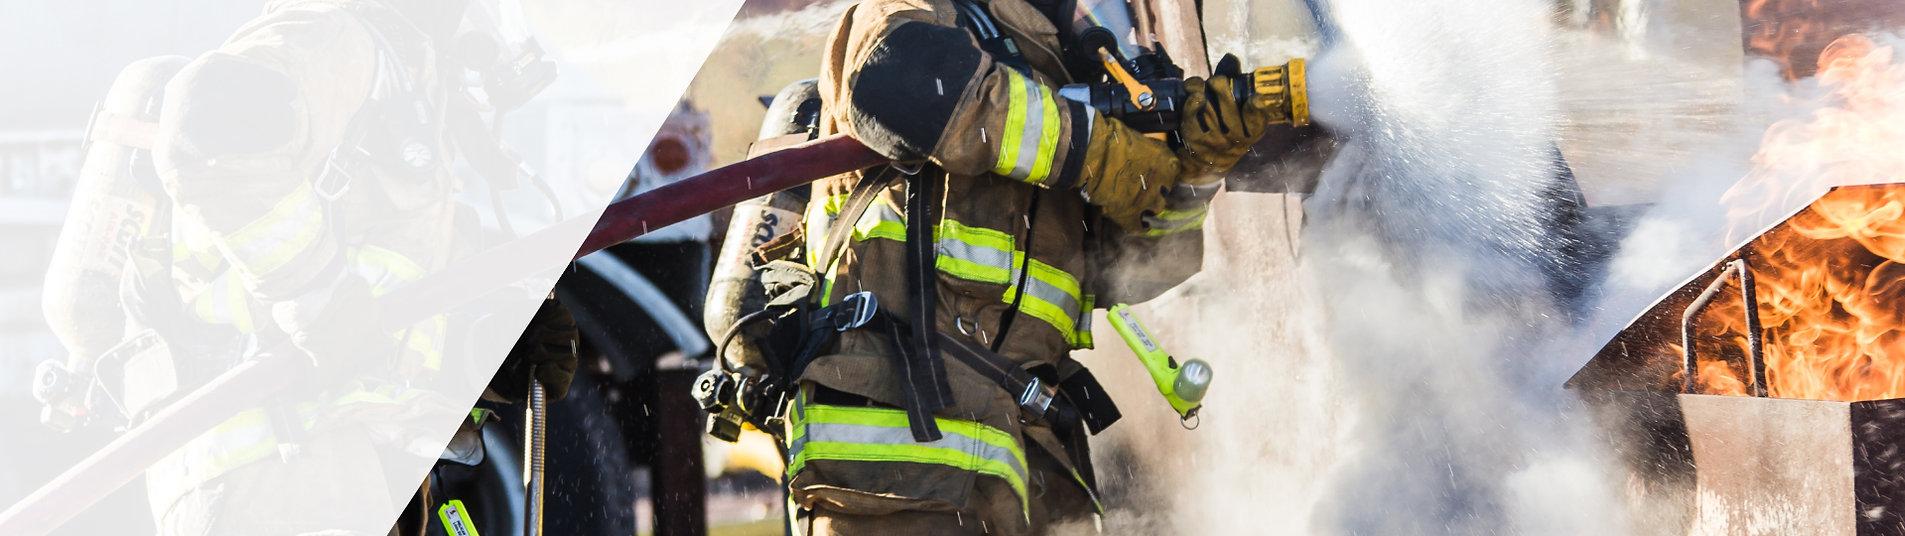 STCW Firefighting Training Spain.jpg